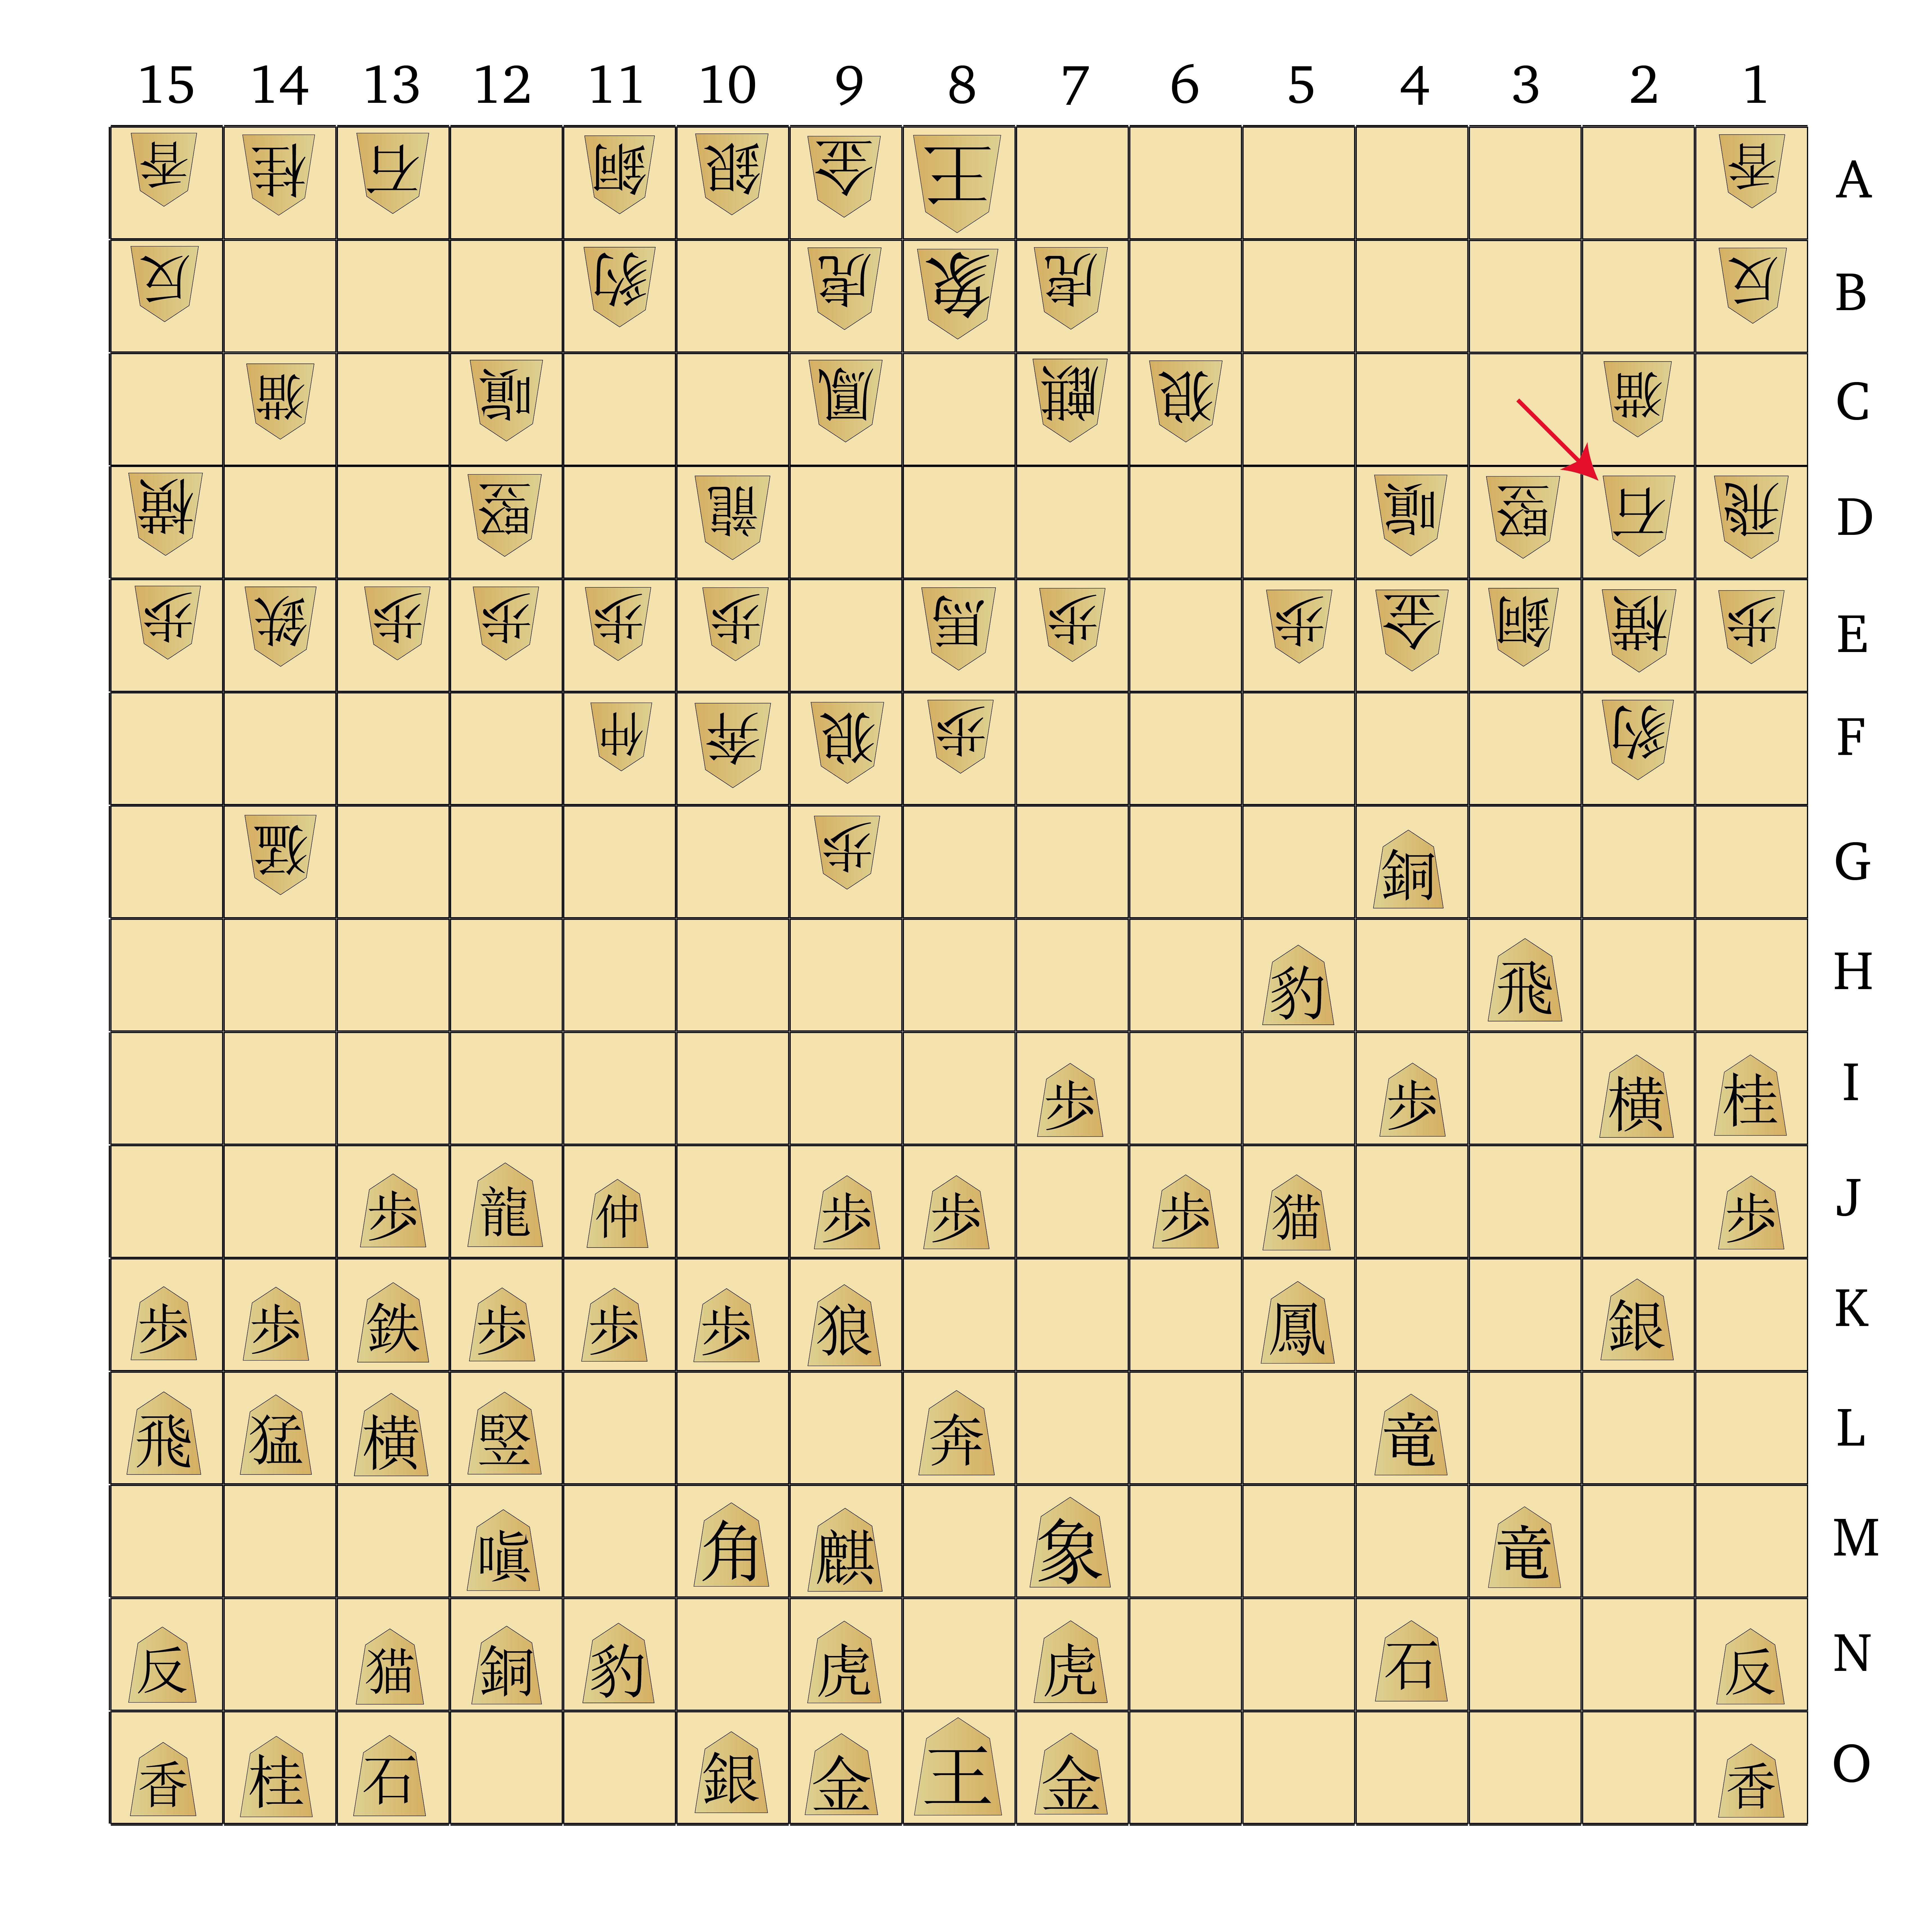 Dai Shogi 420 -- Move 210-01